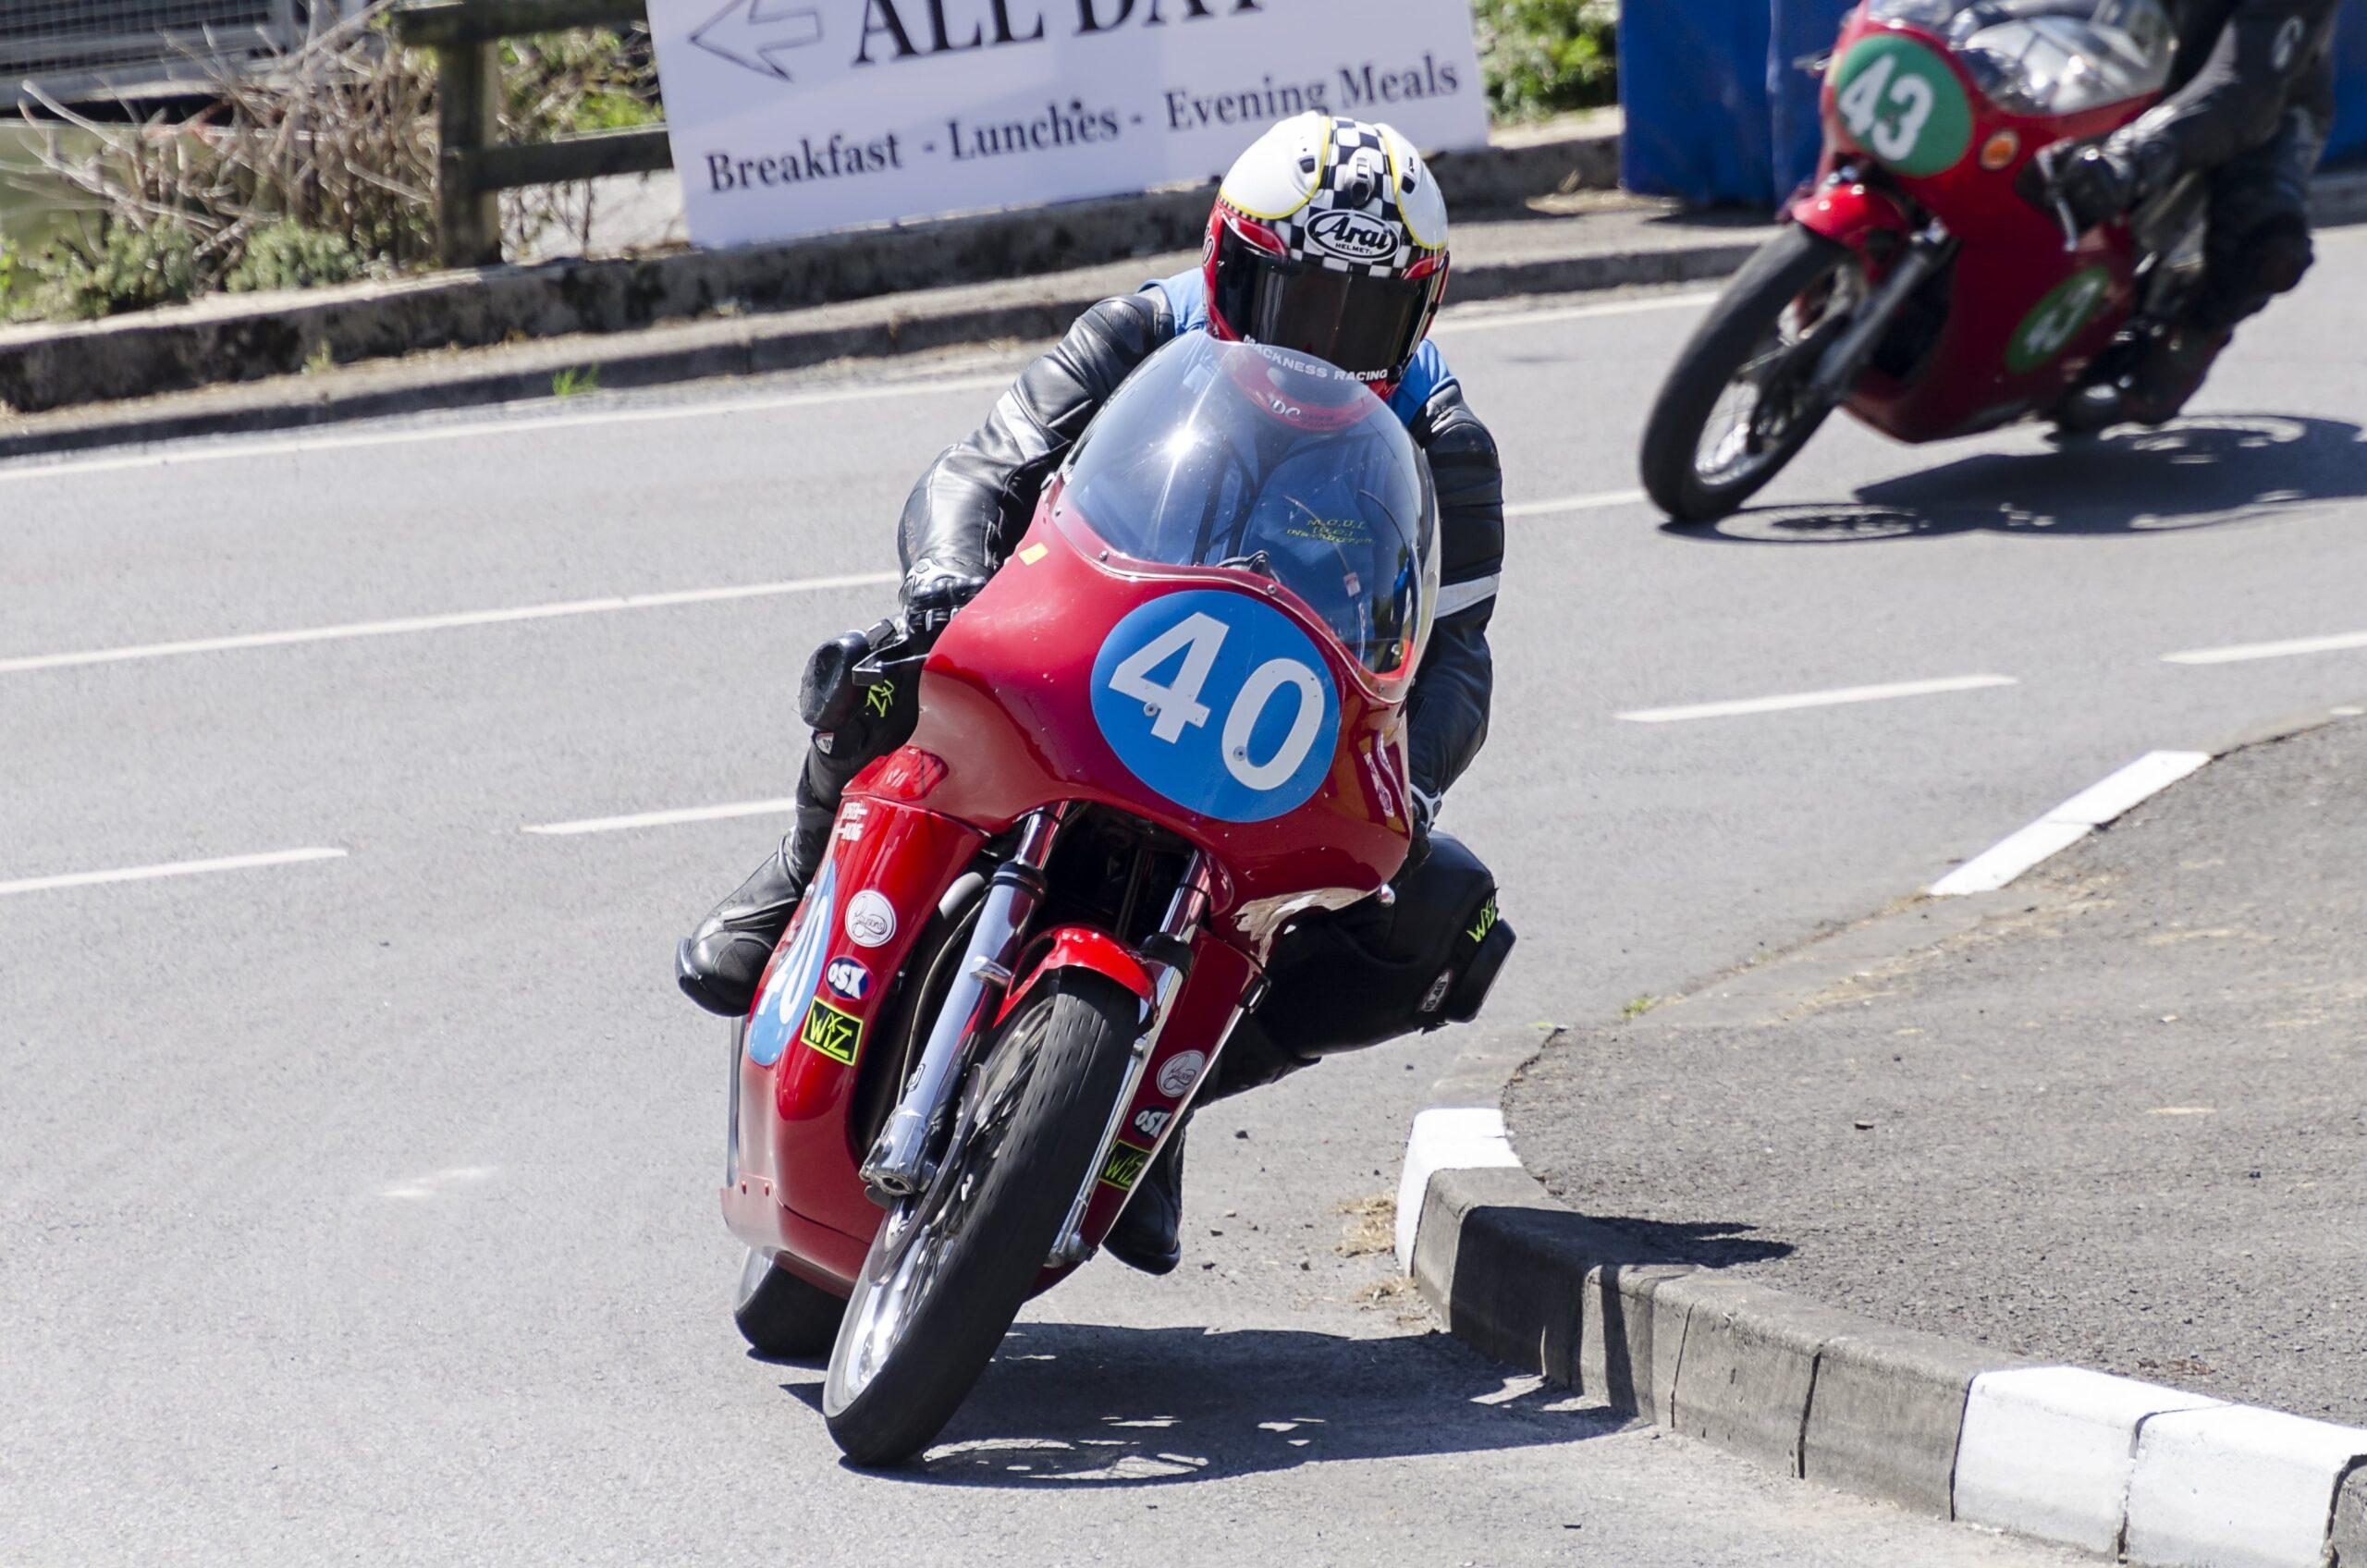 Enniskillen Road Races: Race Day Round Up